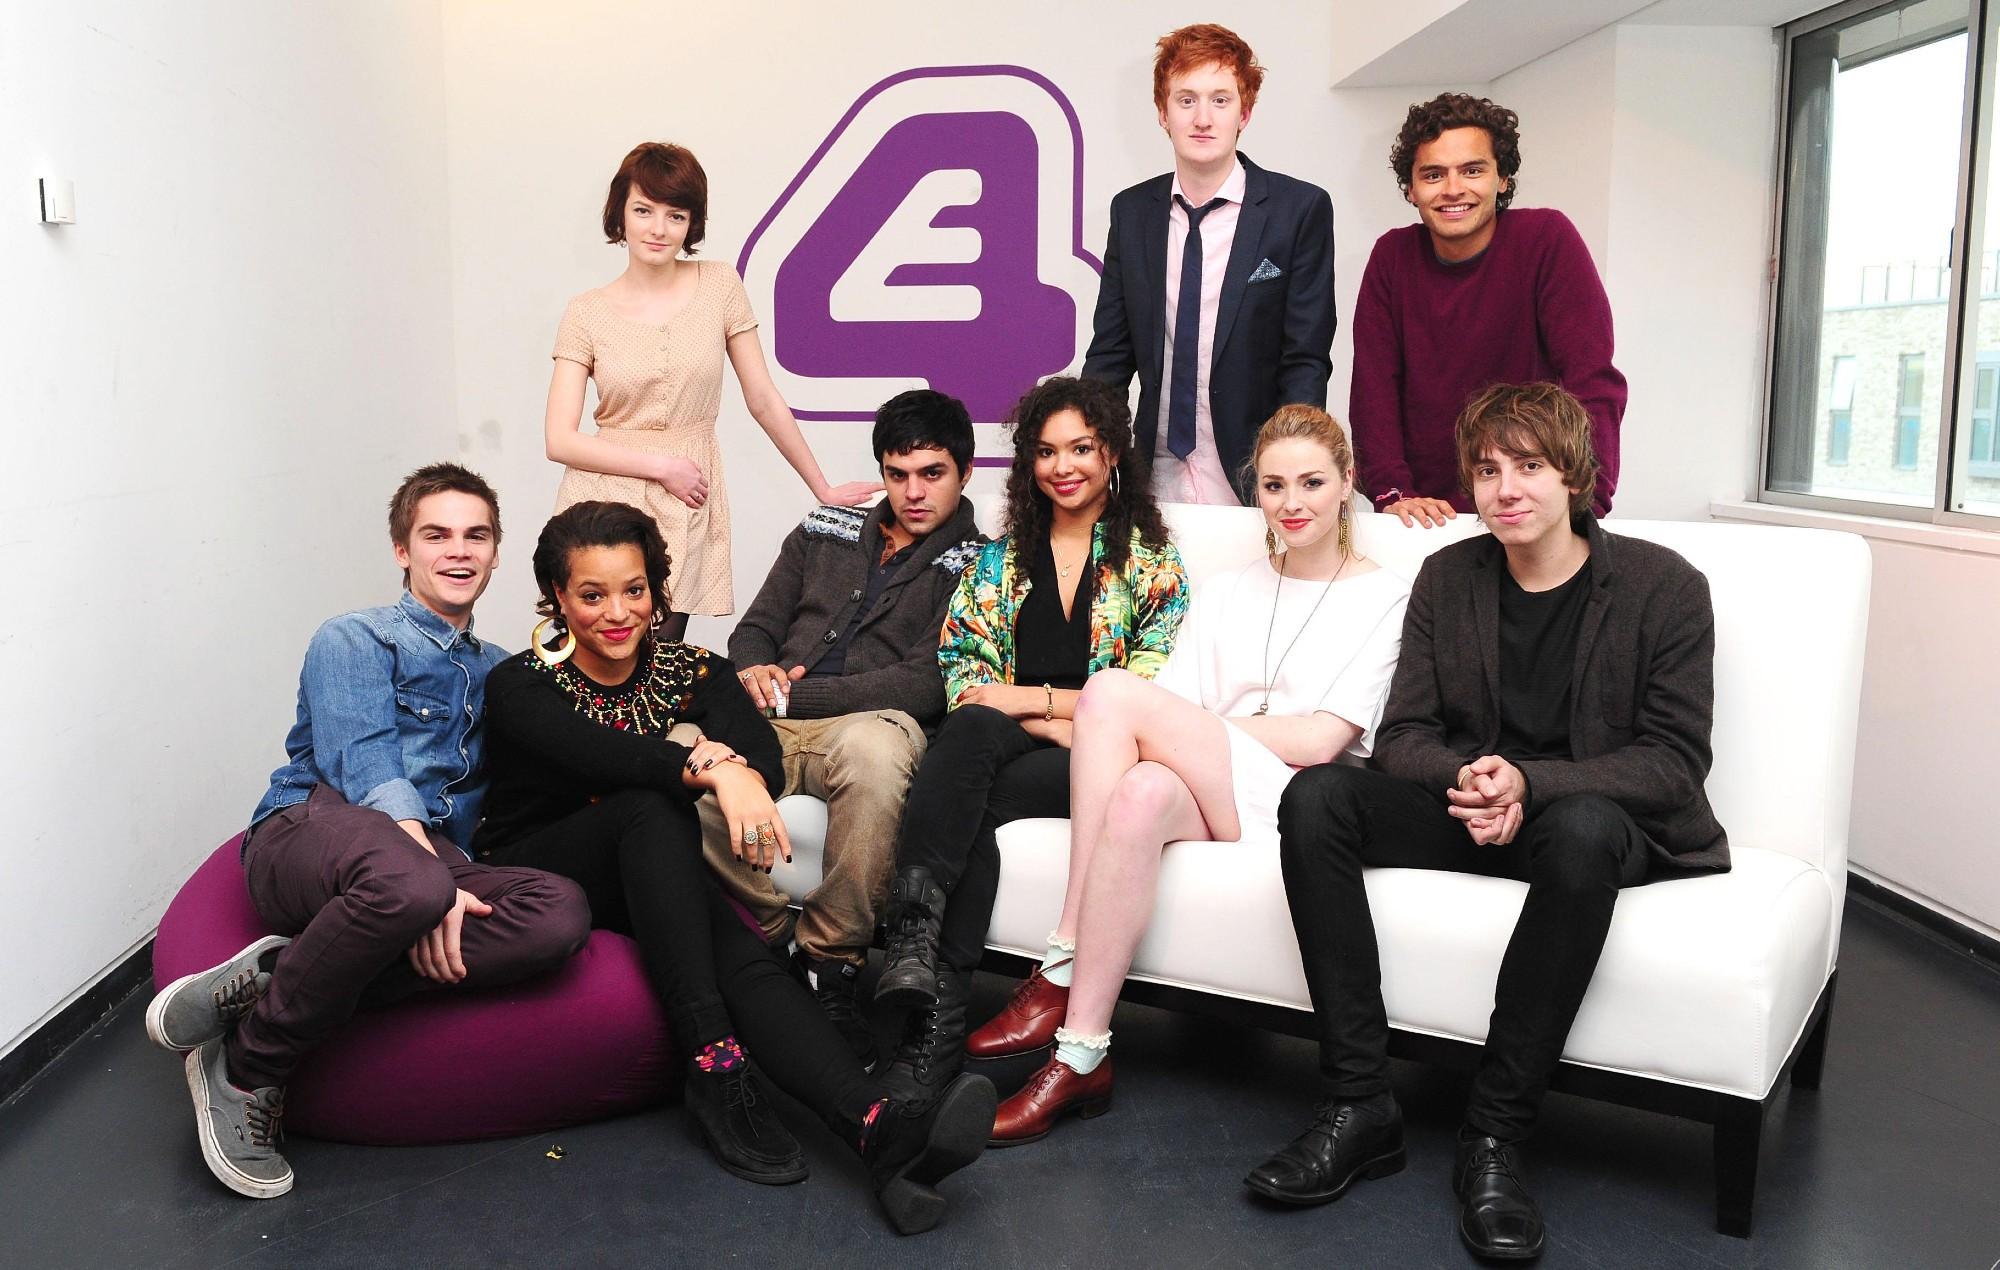 Skins series 3 cast